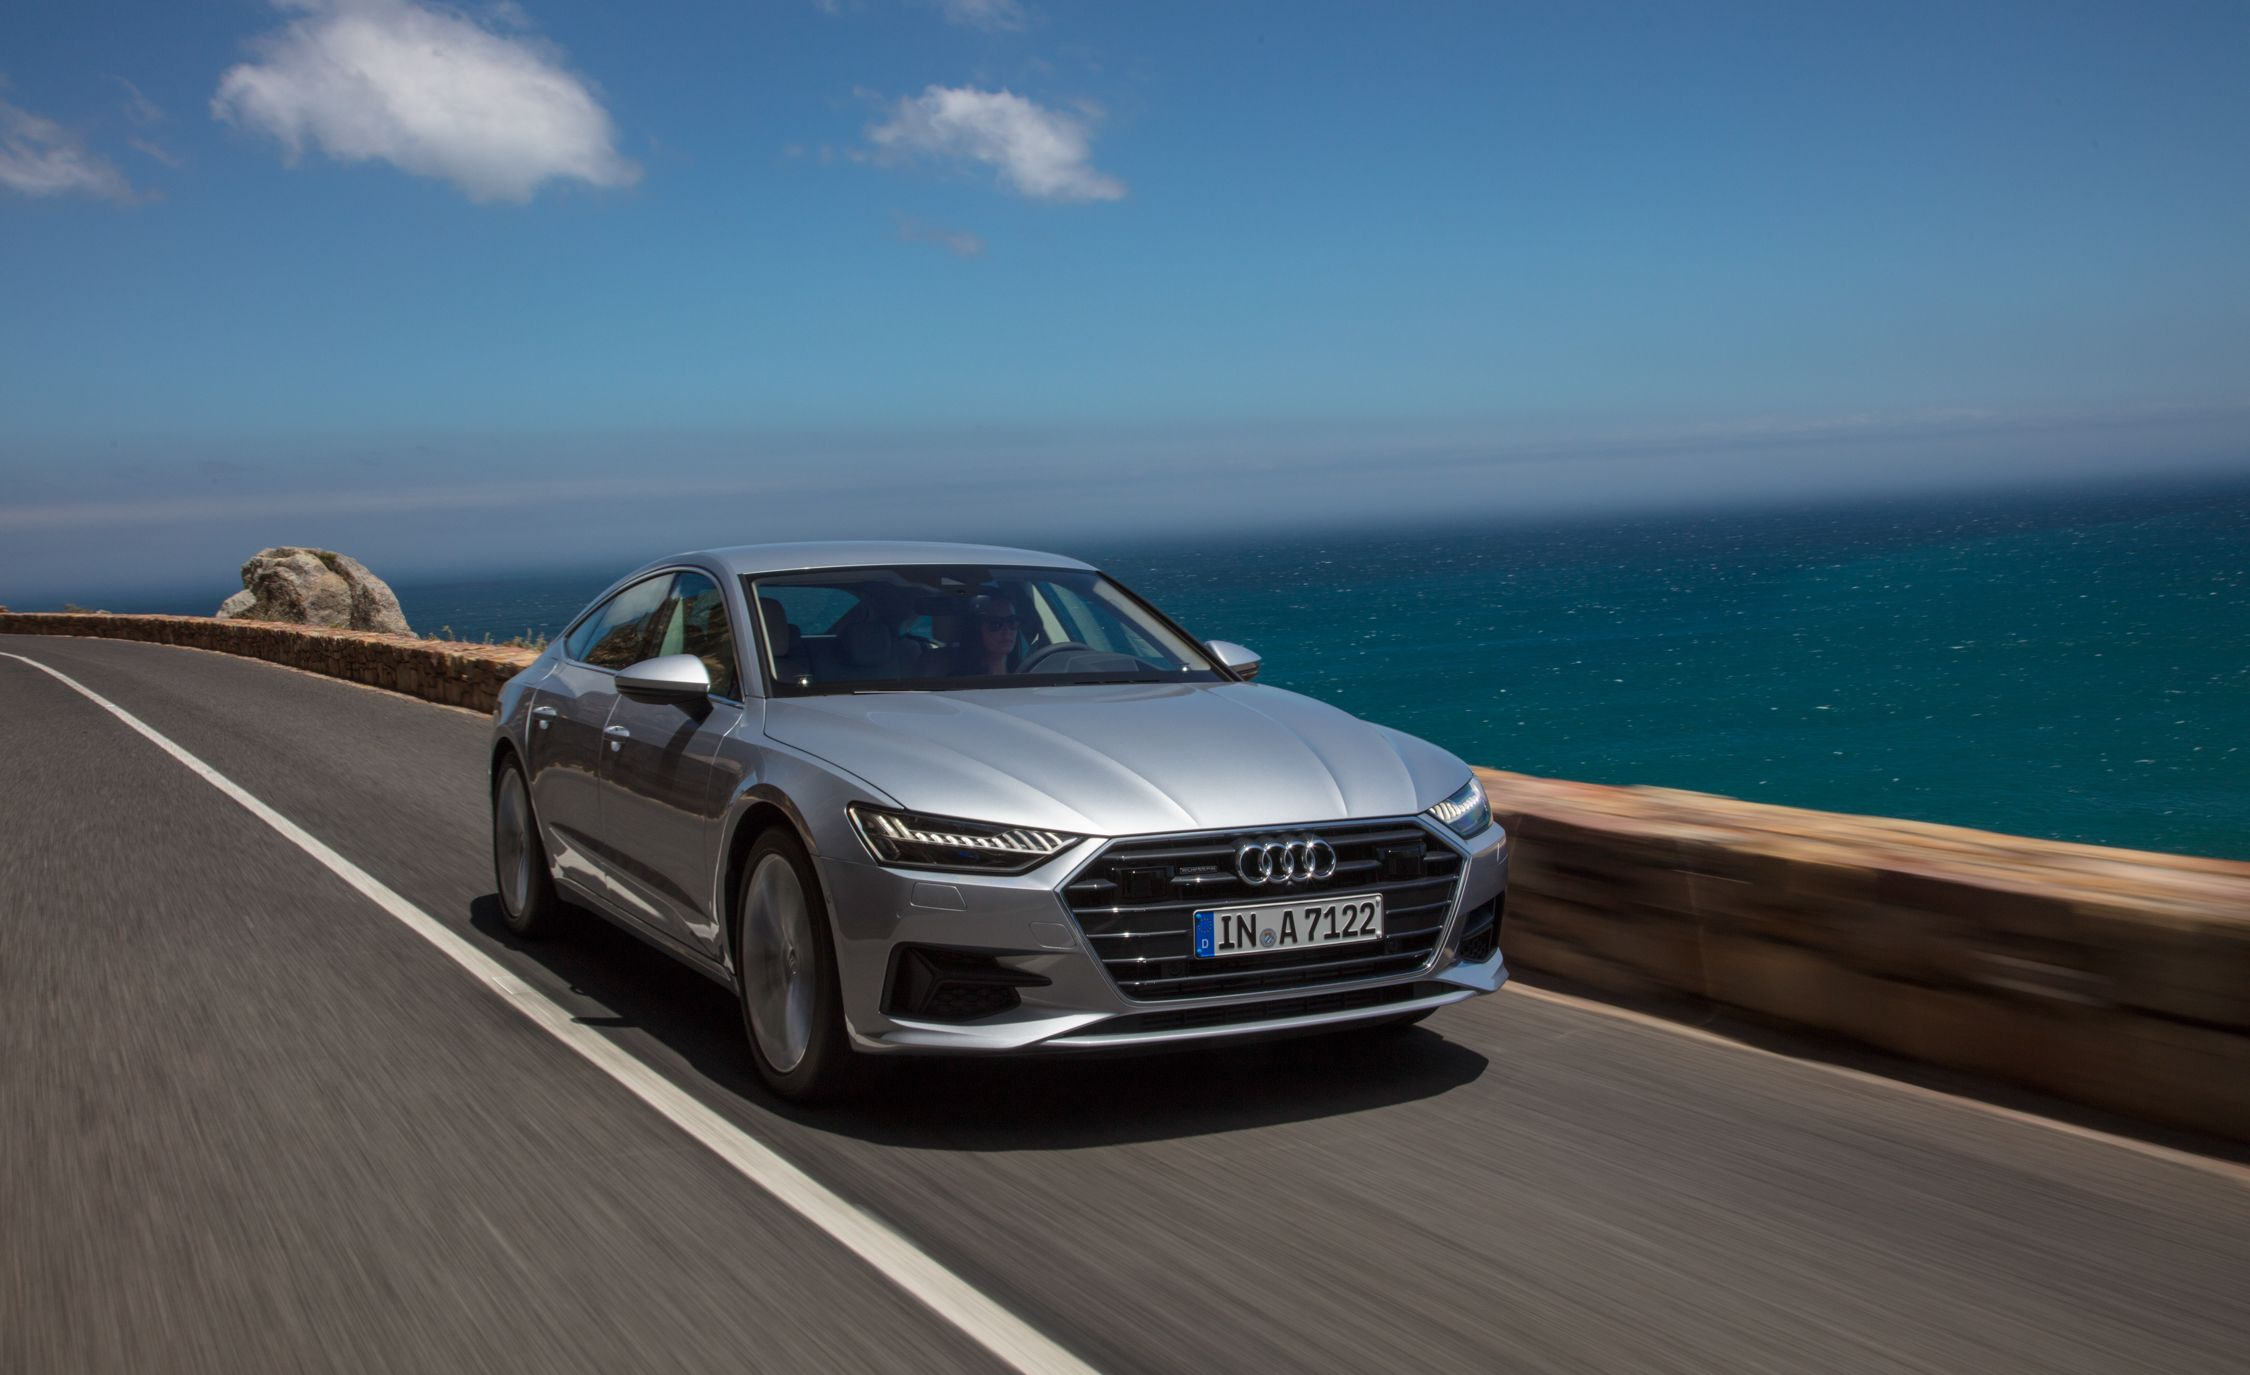 2019-Audi-A7-Sportback-131-1.jpg